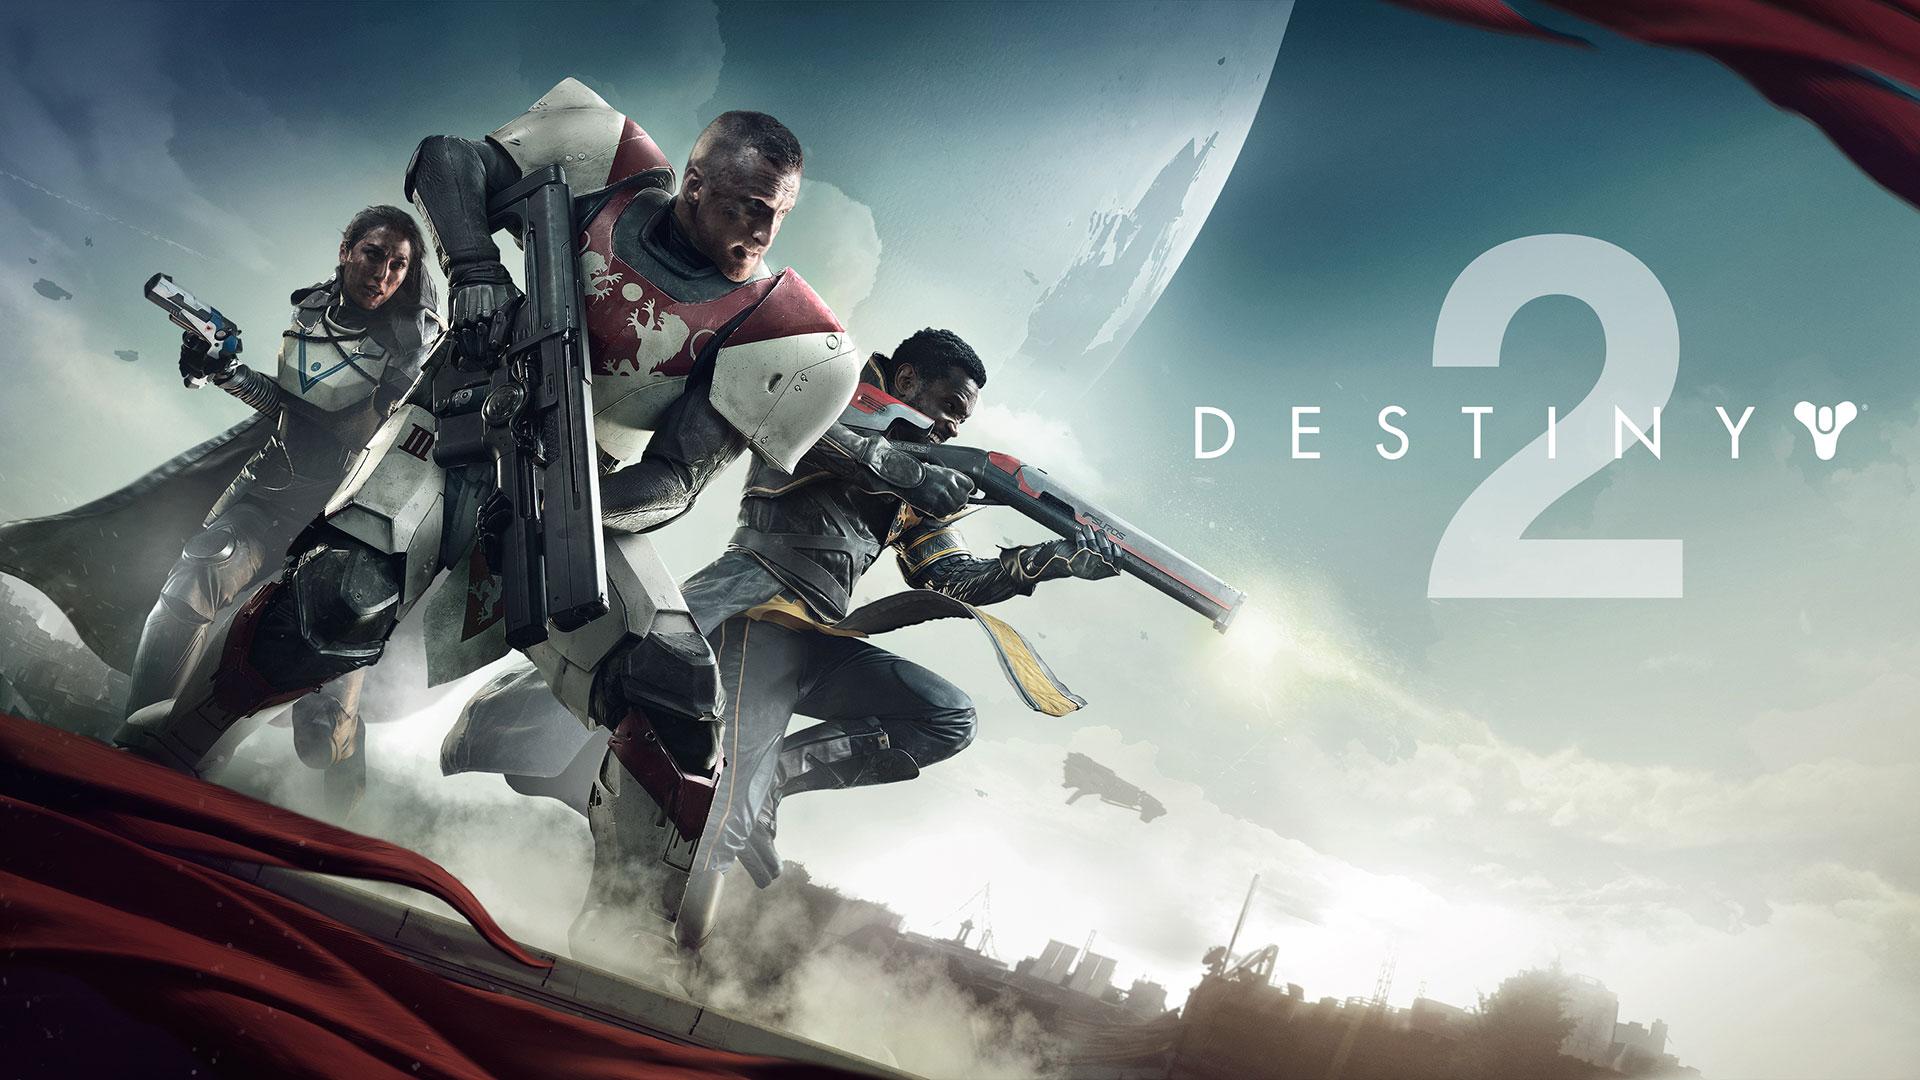 Destiny 2  1st Week Sales Figures Revealed – Less Than Half of Original